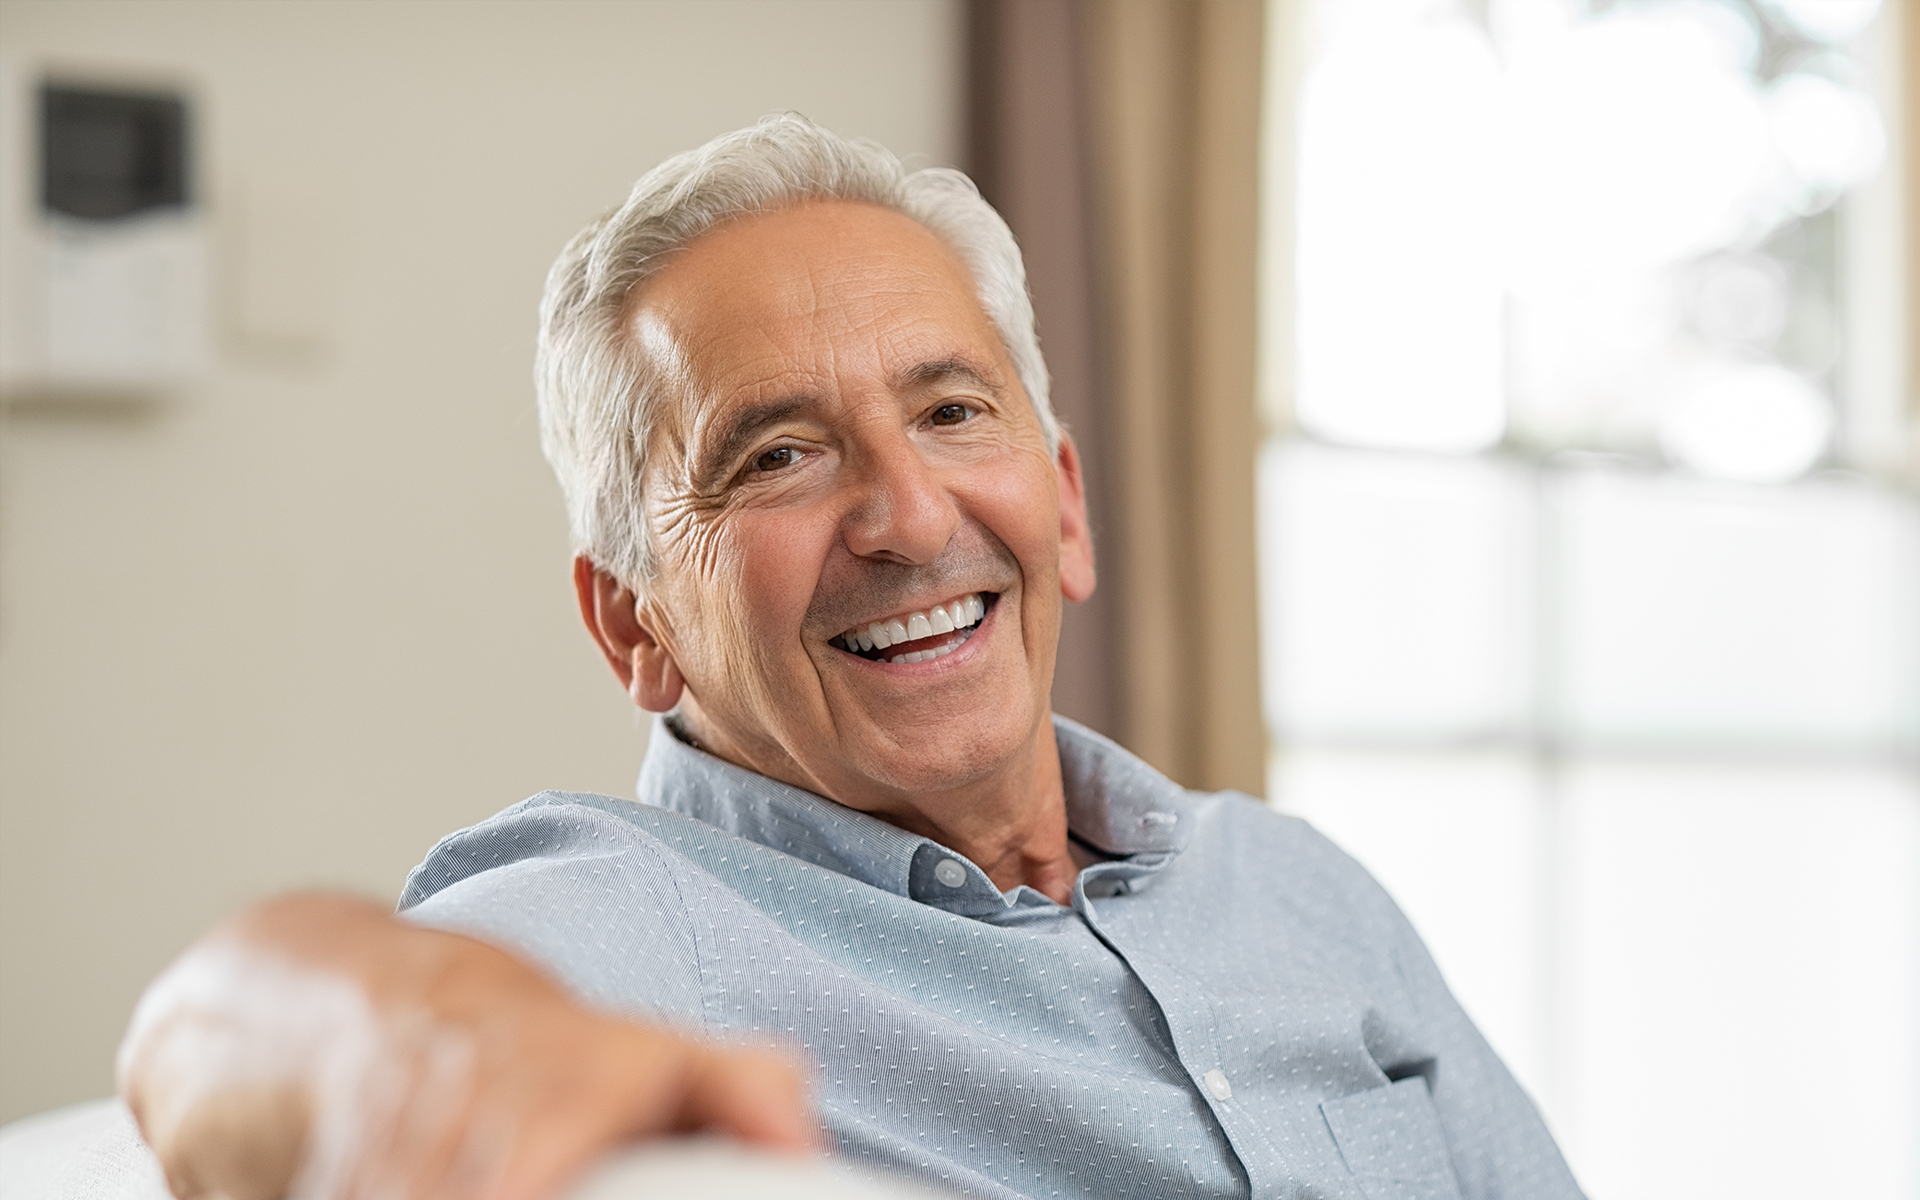 smiling older gentleman with face wrinkles